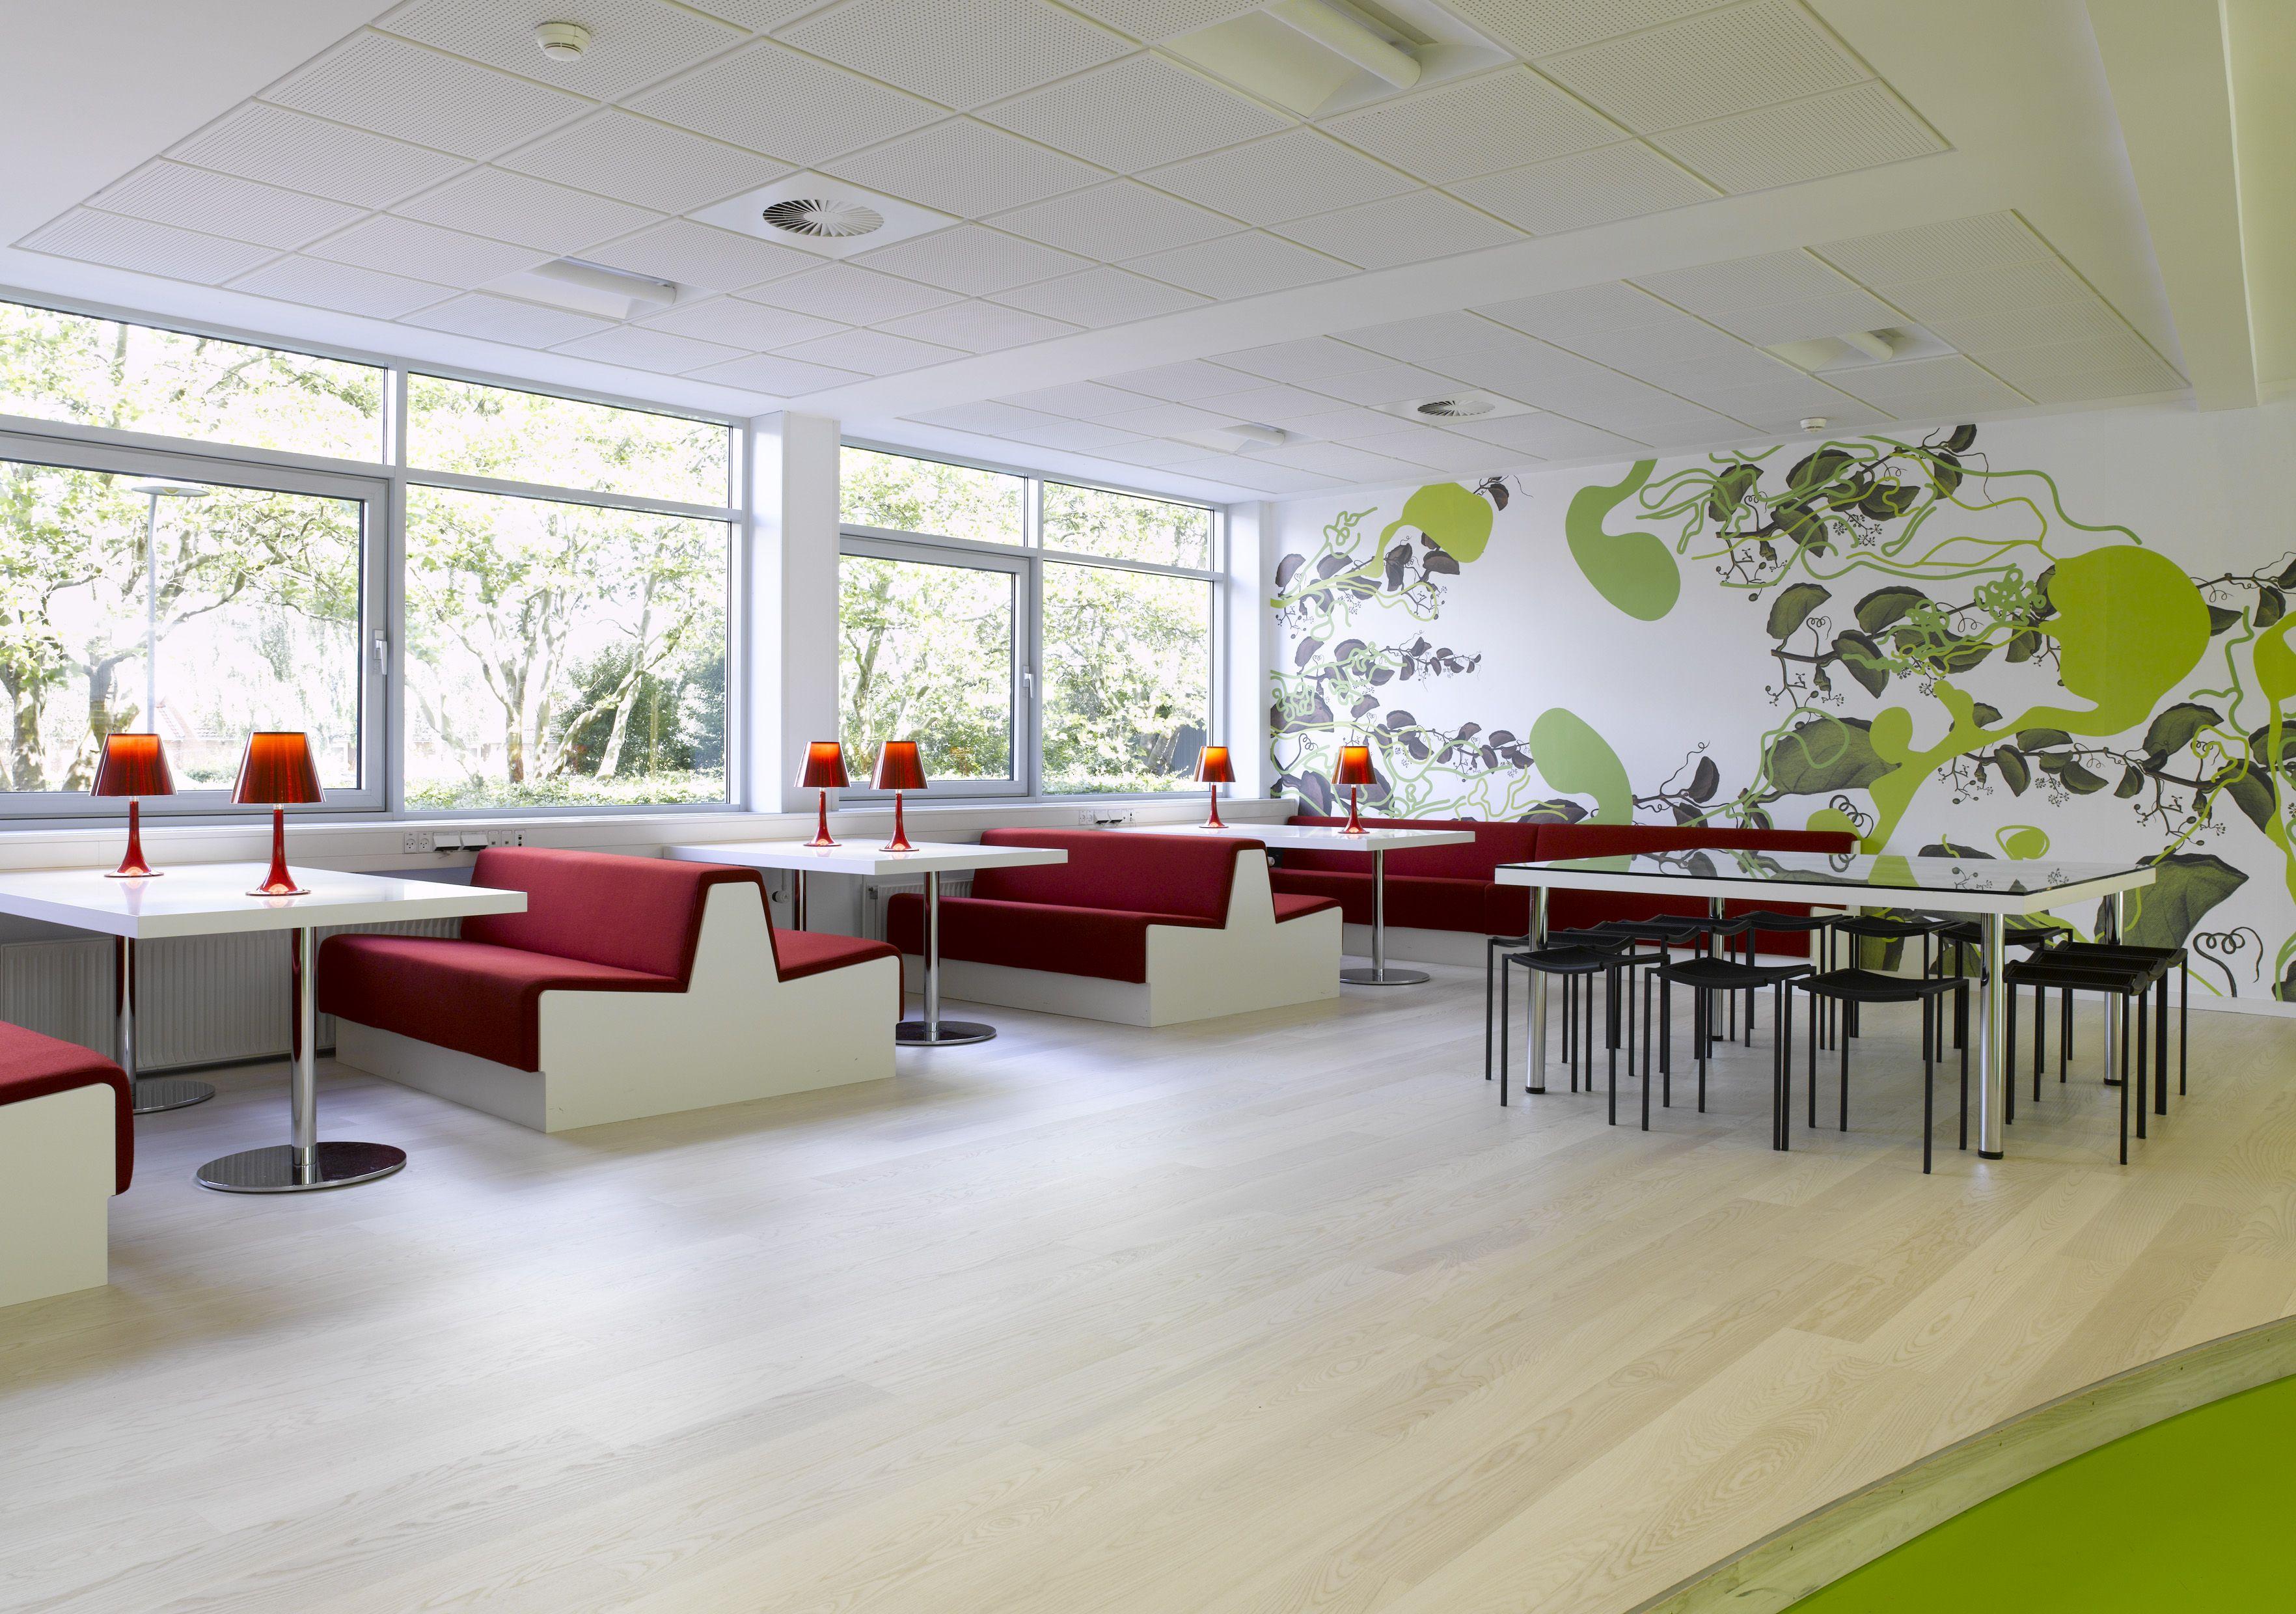 interior design school austin - 1000+ images about IDS 611: Ippon Palette on Pinterest Modern ...